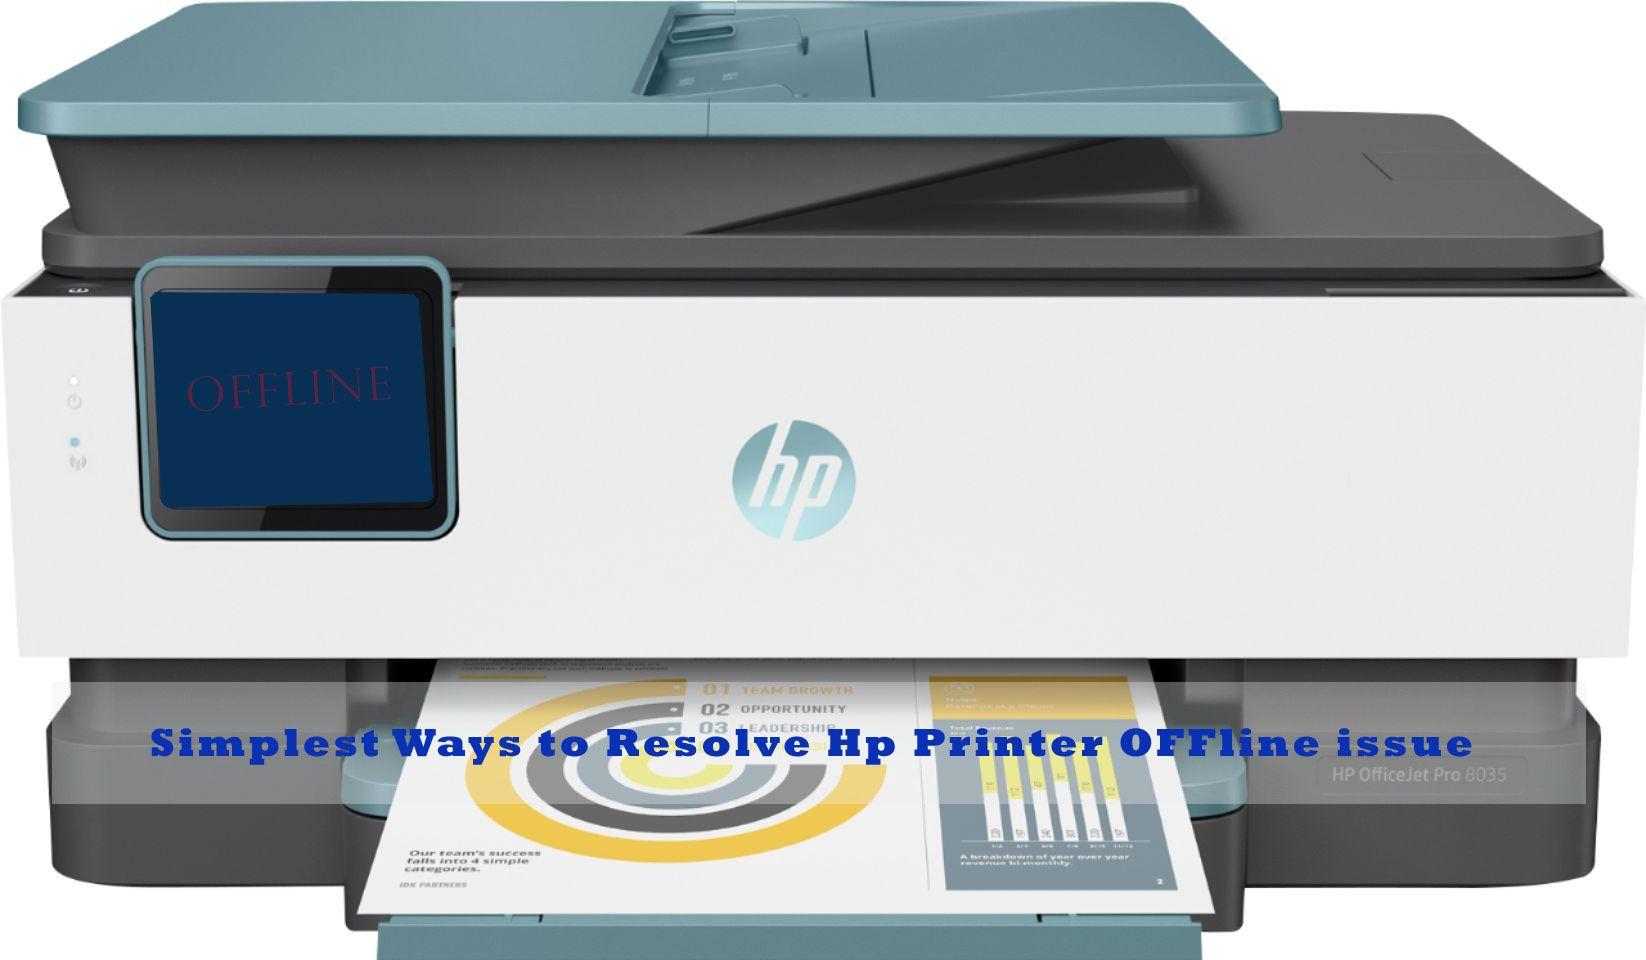 Simplest Ways to Resolve Hp Printer Issue. Hp printer